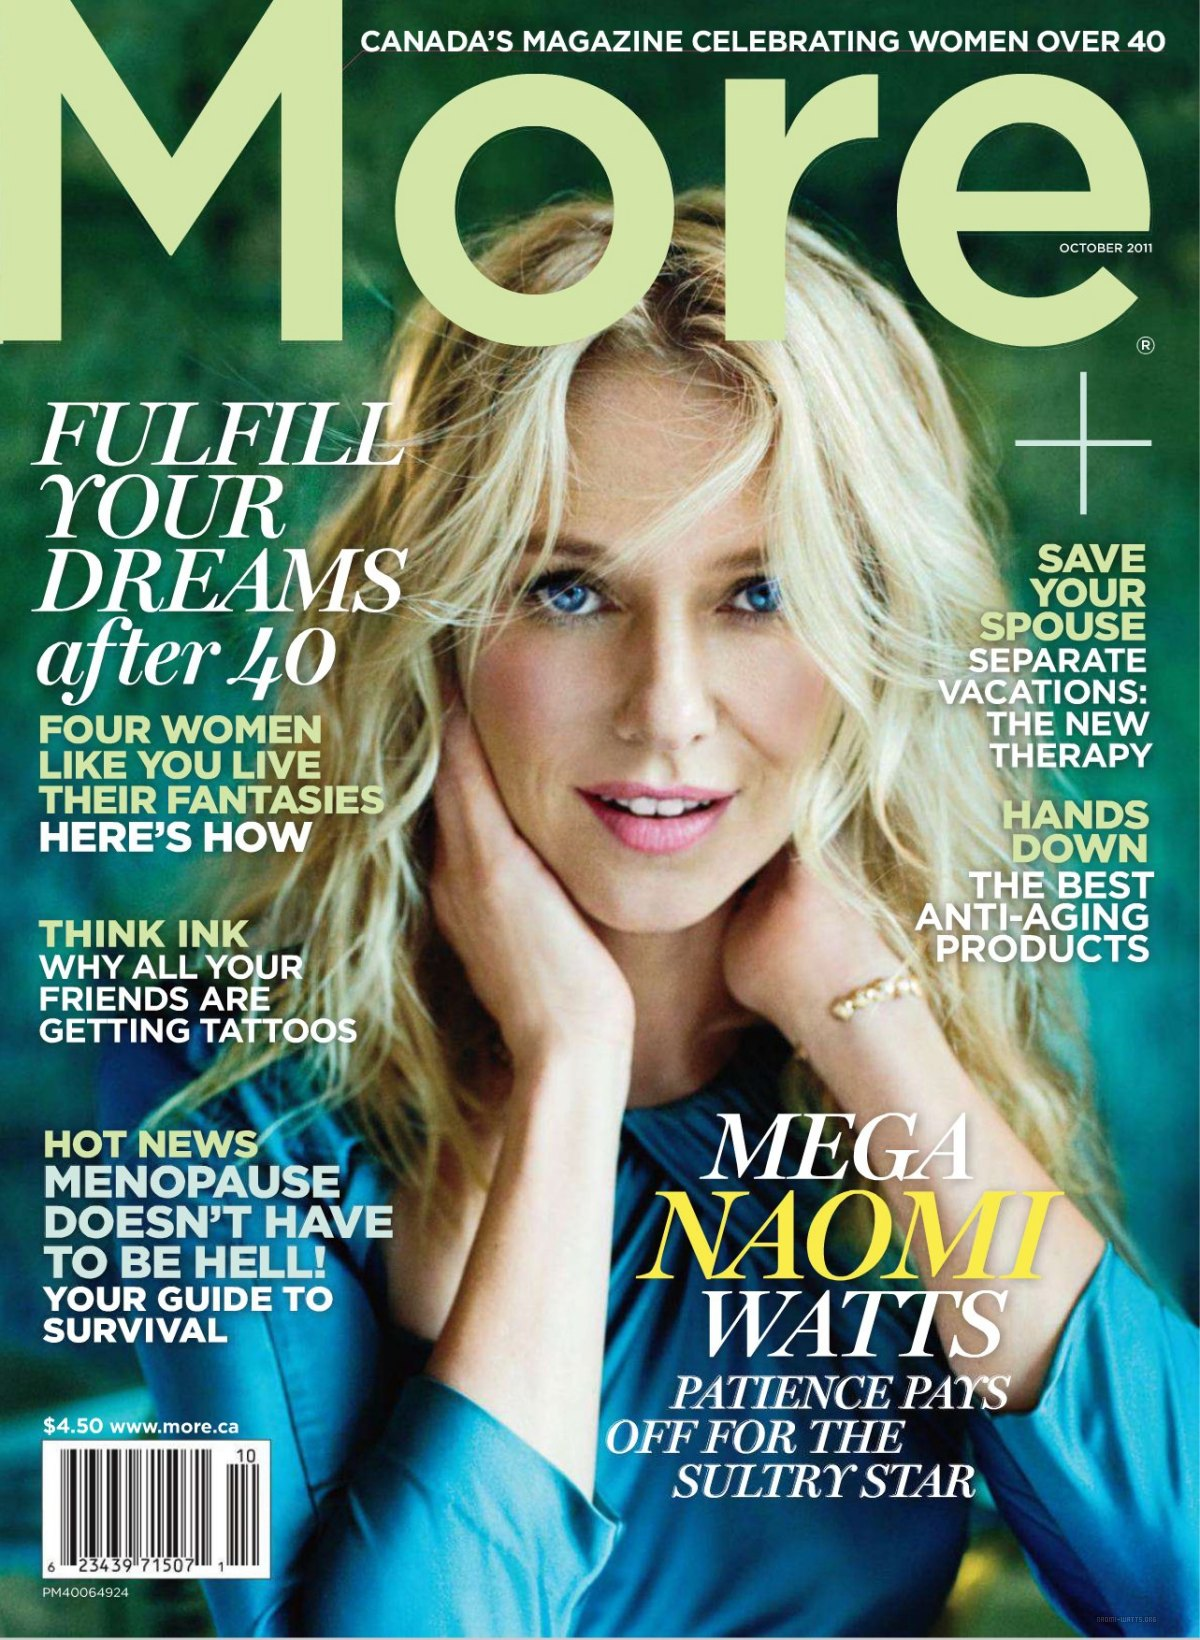 More Magazine November 2014 Issue: More Magazine Oct. 2011